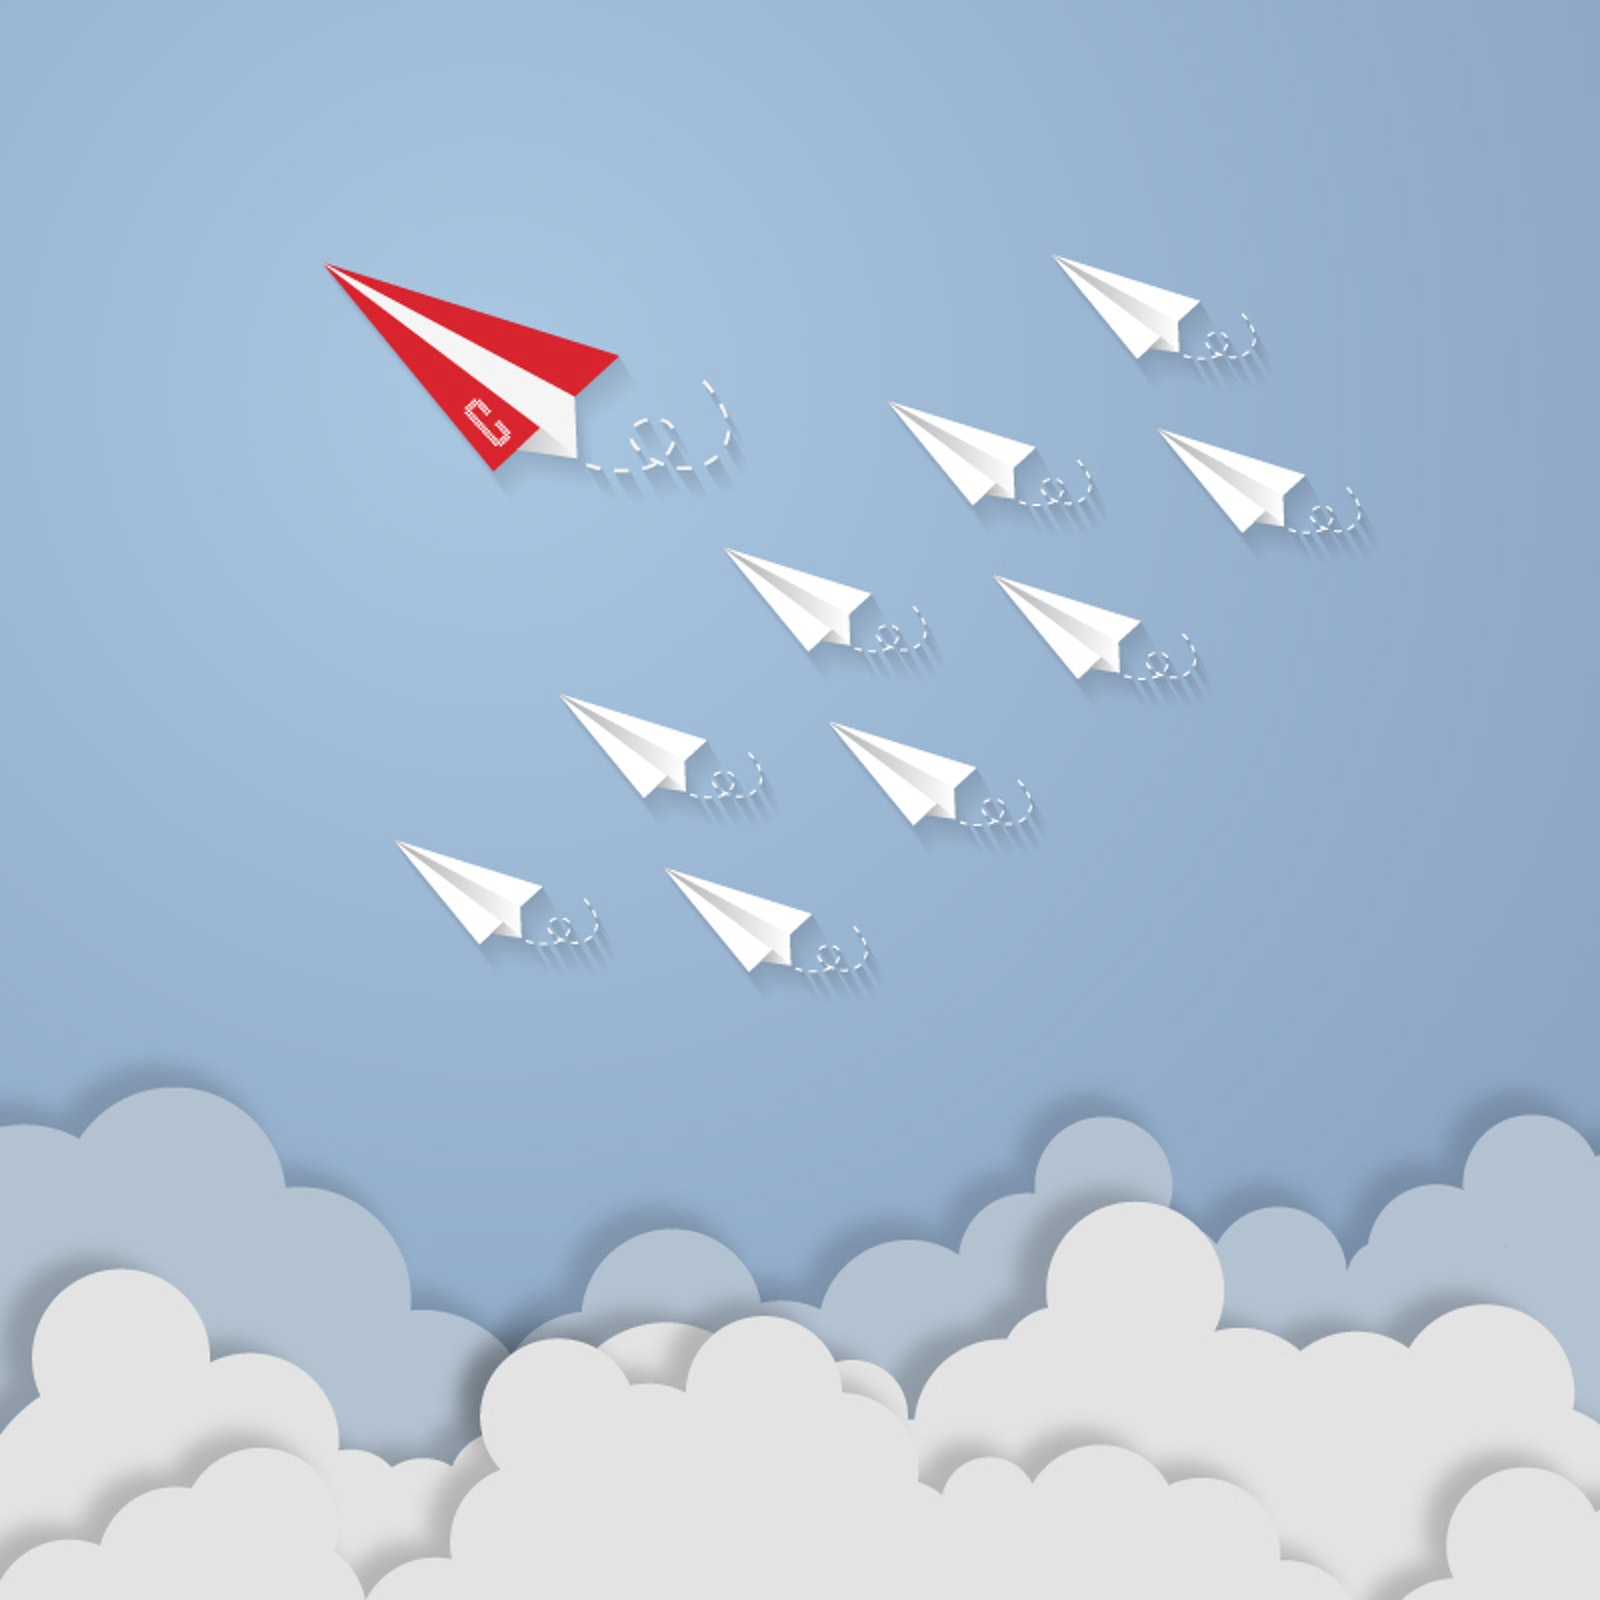 CAP accountmgr paperplanes